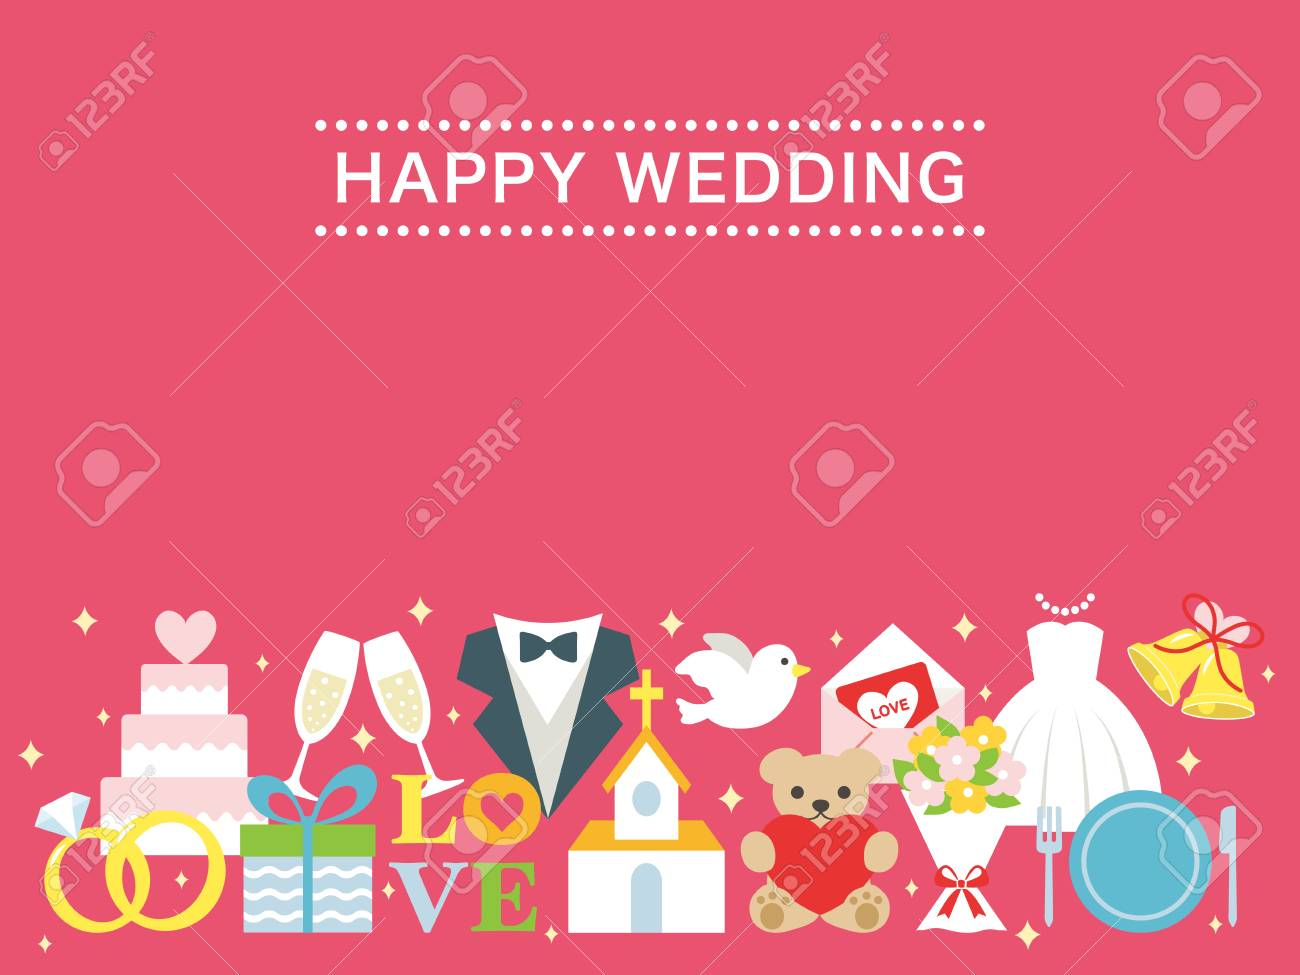 Happy wedding greeting card royalty free cliparts vectors and happy wedding greeting card stock vector 75760158 m4hsunfo